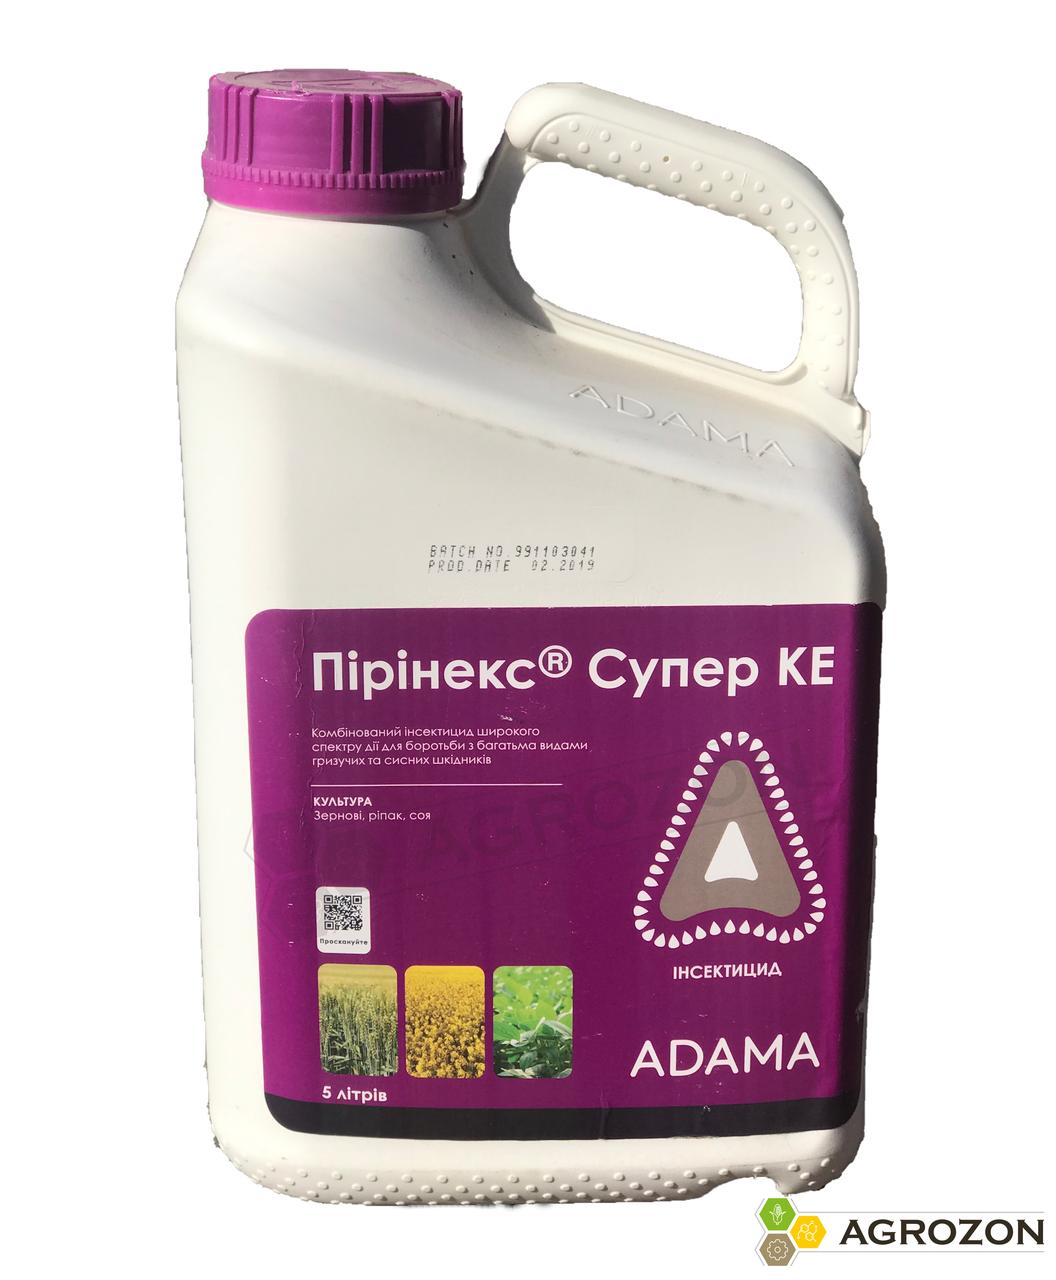 Инсектицид Пиринекс Супер (Нурел Д) ADAMA - 5 л